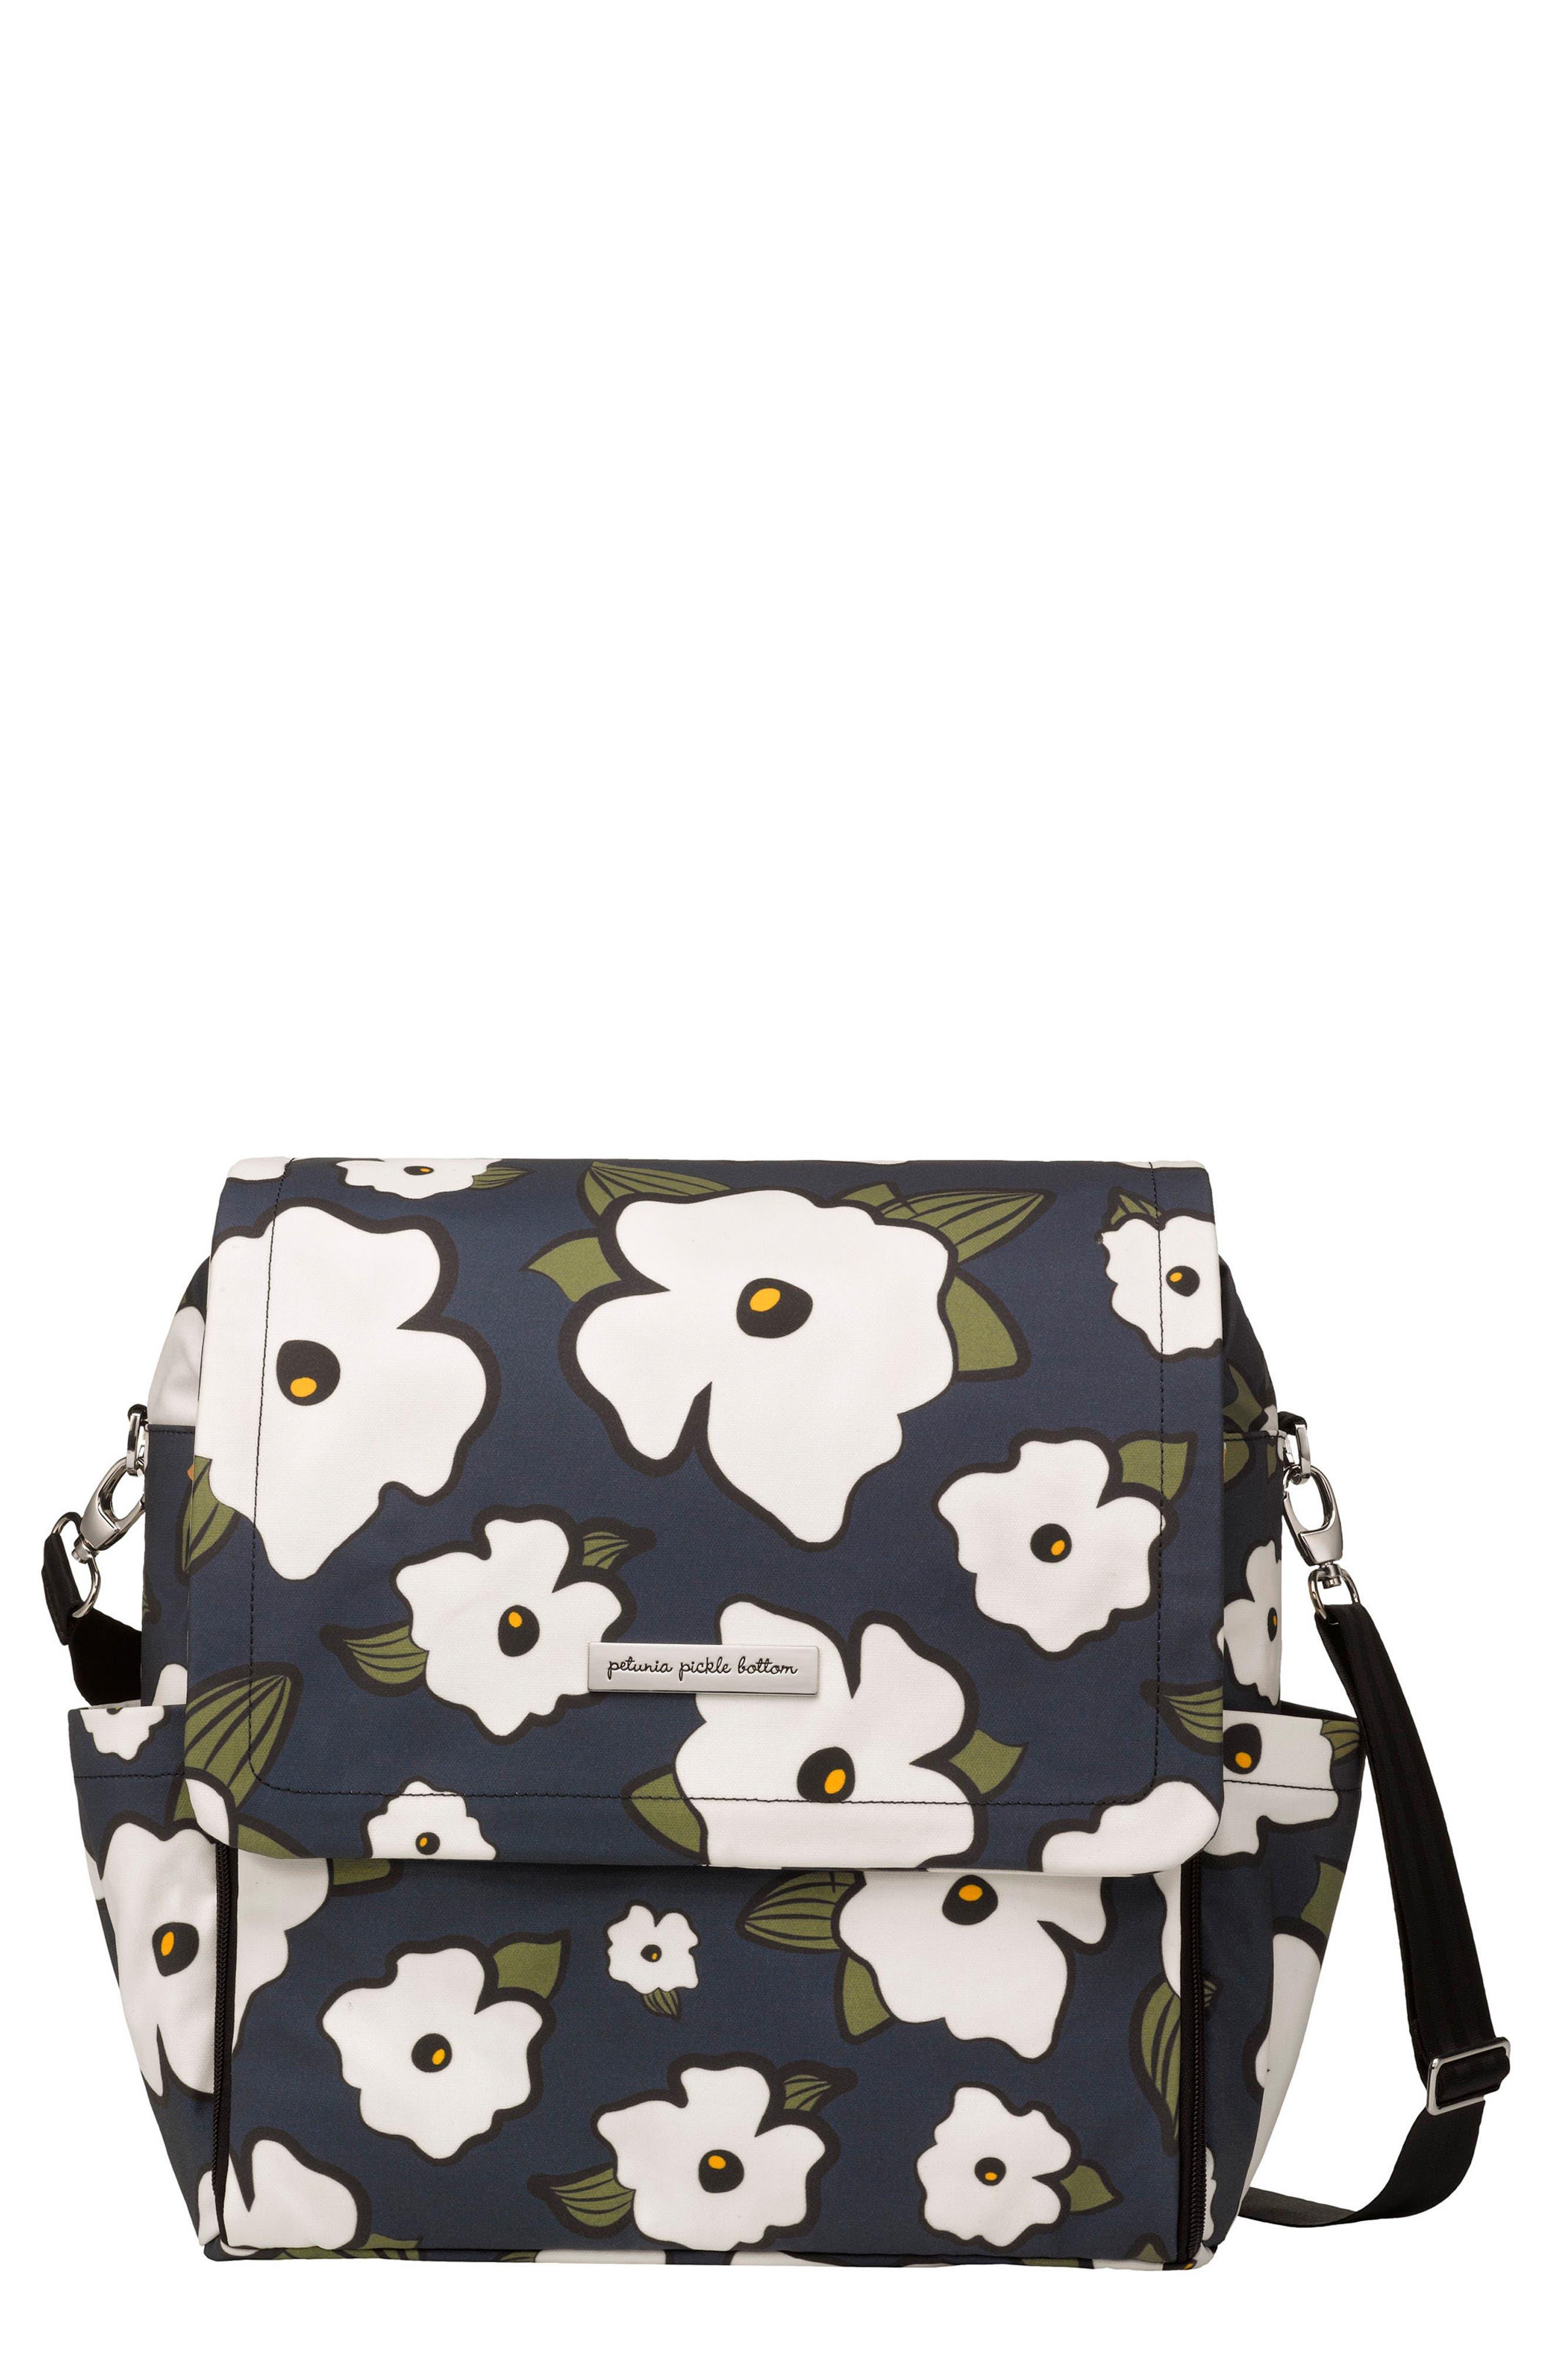 Alternate Image 1 Selected - Petunia Pickle Bottom 'Boxy Glazed' Diaper Bag